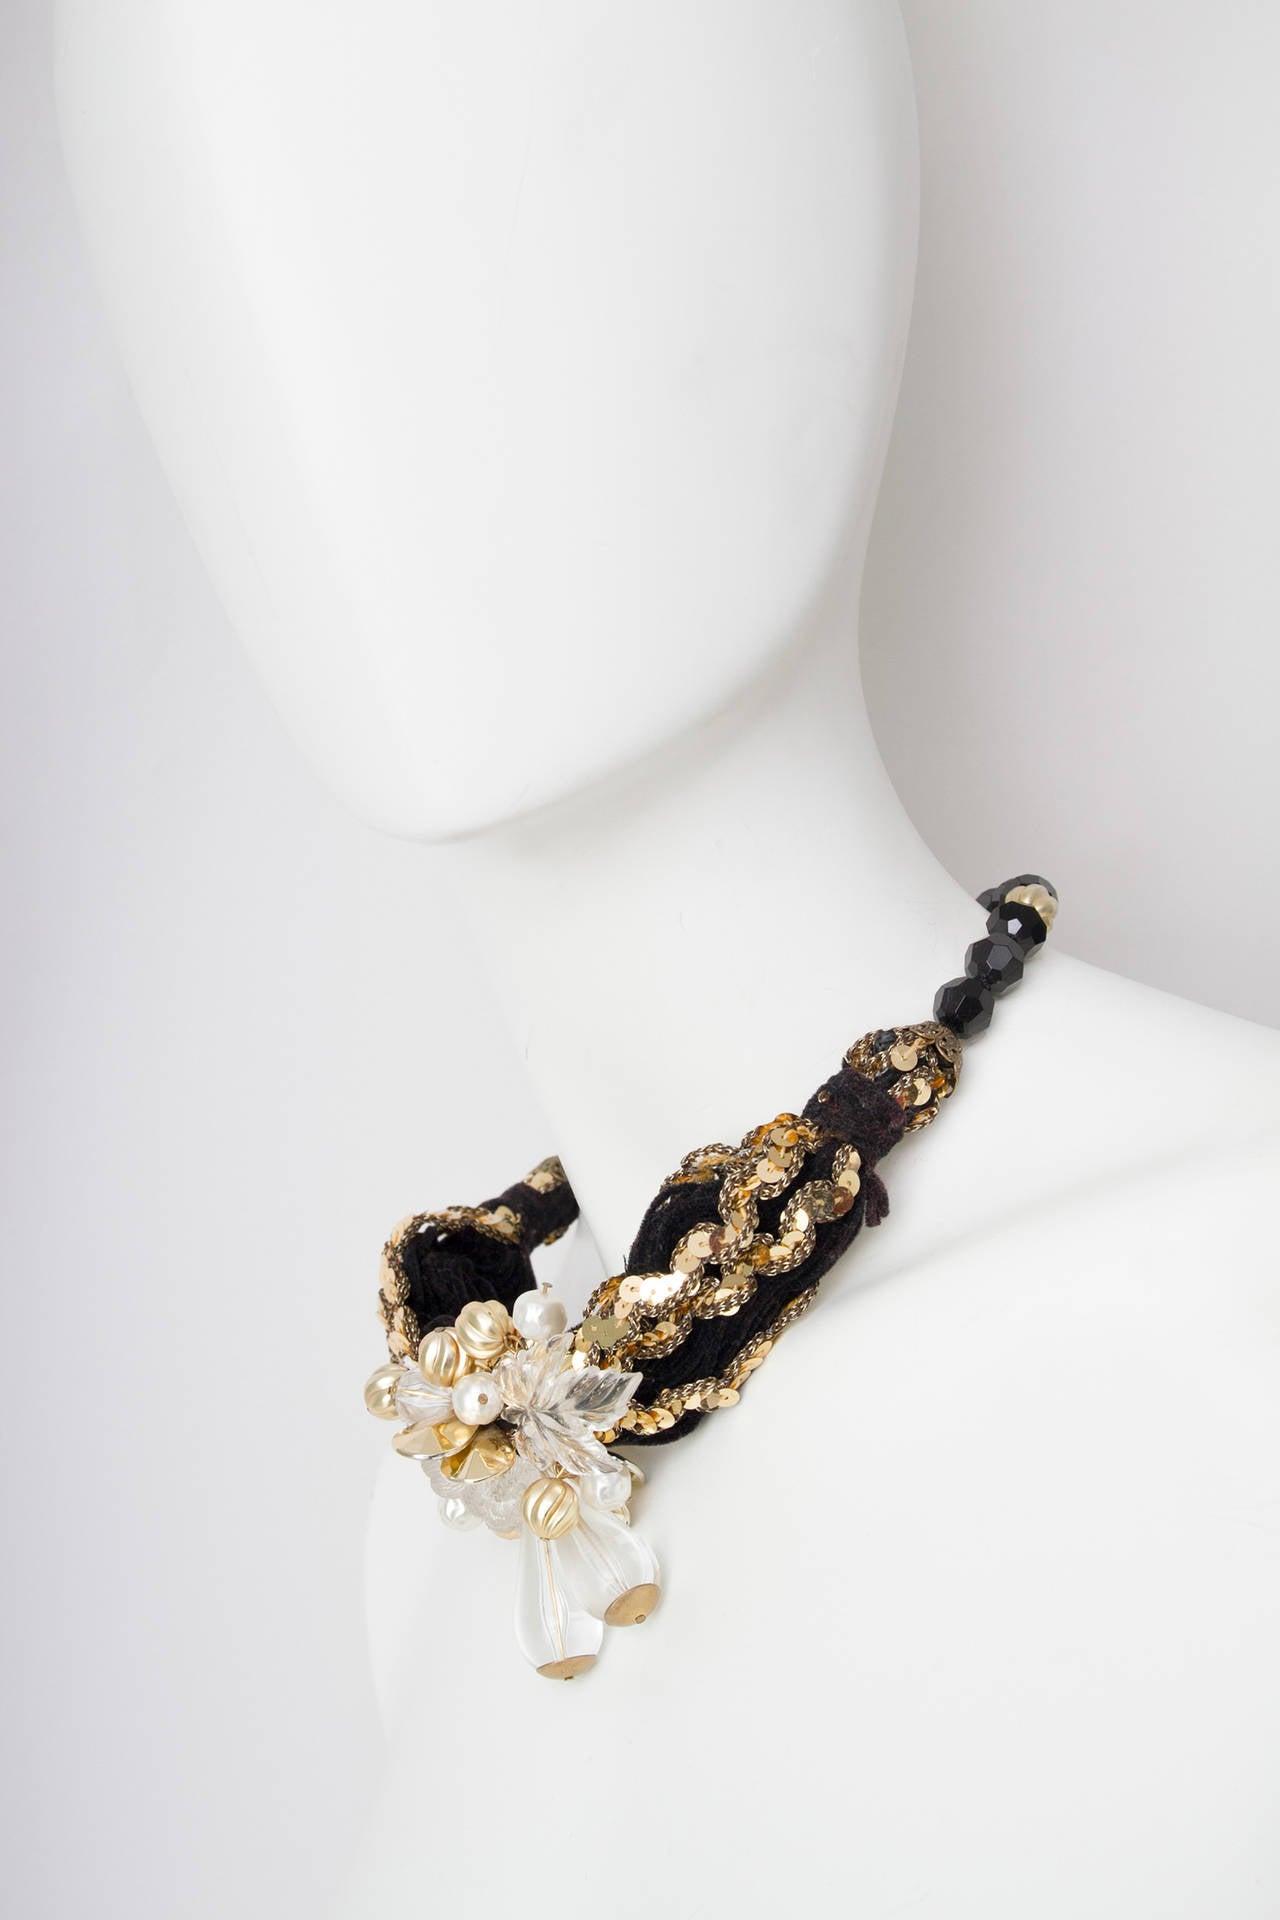 70s Pierre Cardin Black Beads & Gold Sequin Necklace 4